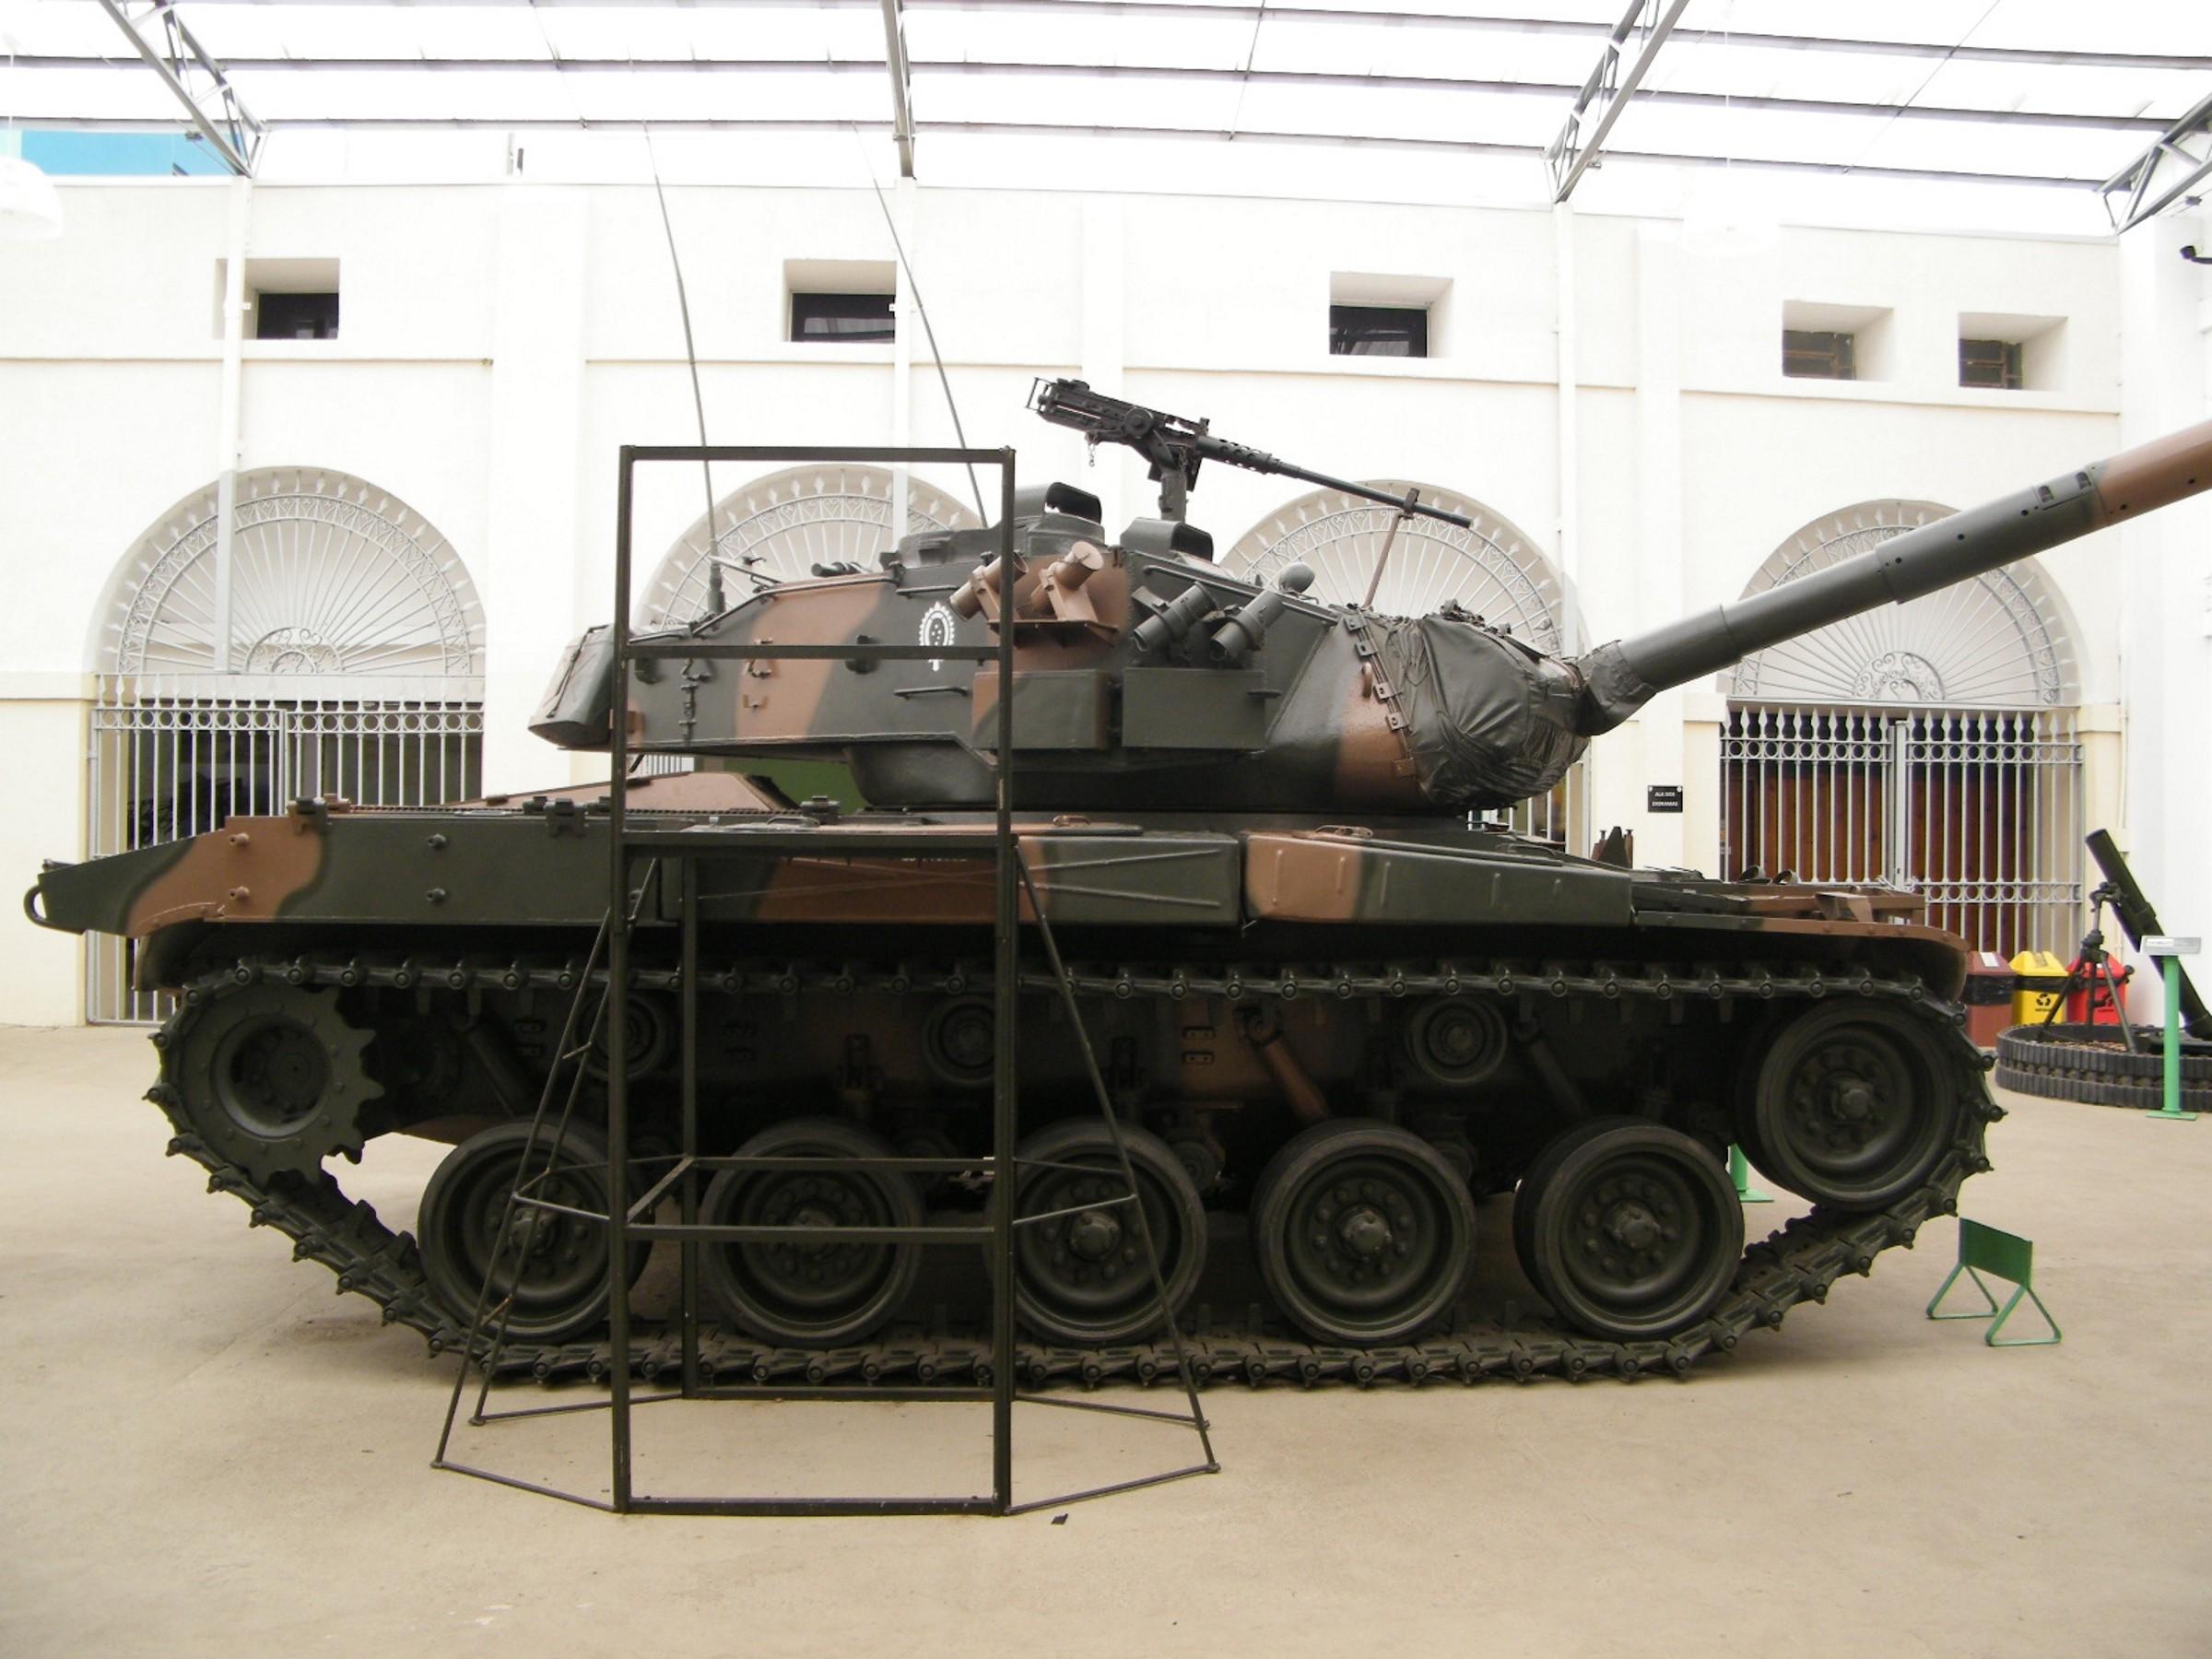 M41B Walker Buldog